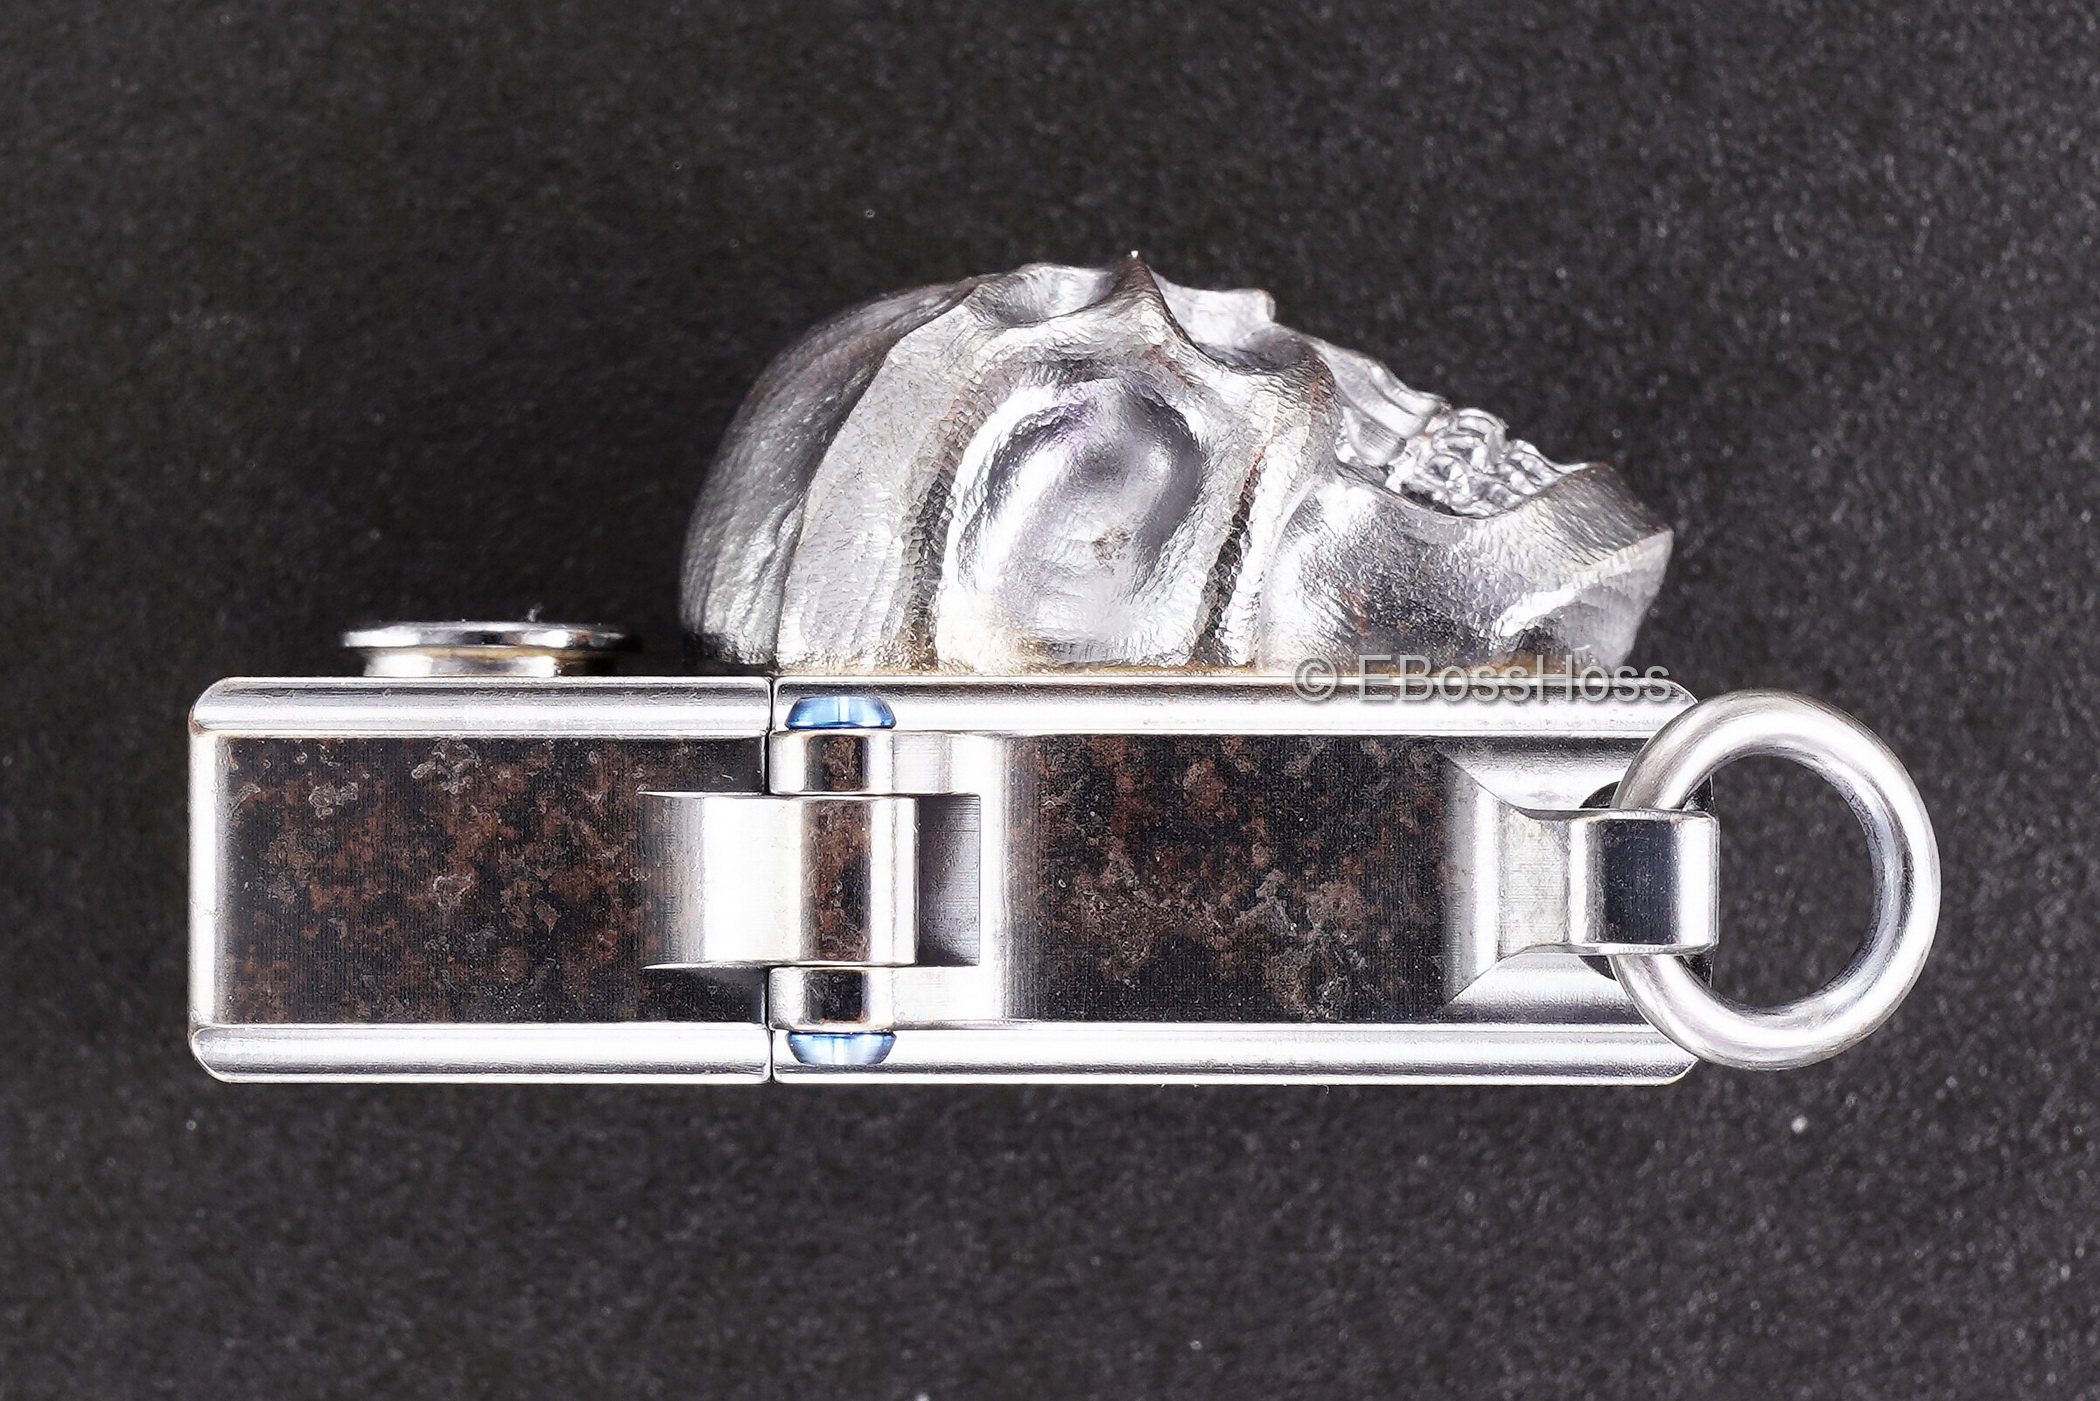 3D Sledge Bronze Lighter - with XXL Darkness & .45 Casing